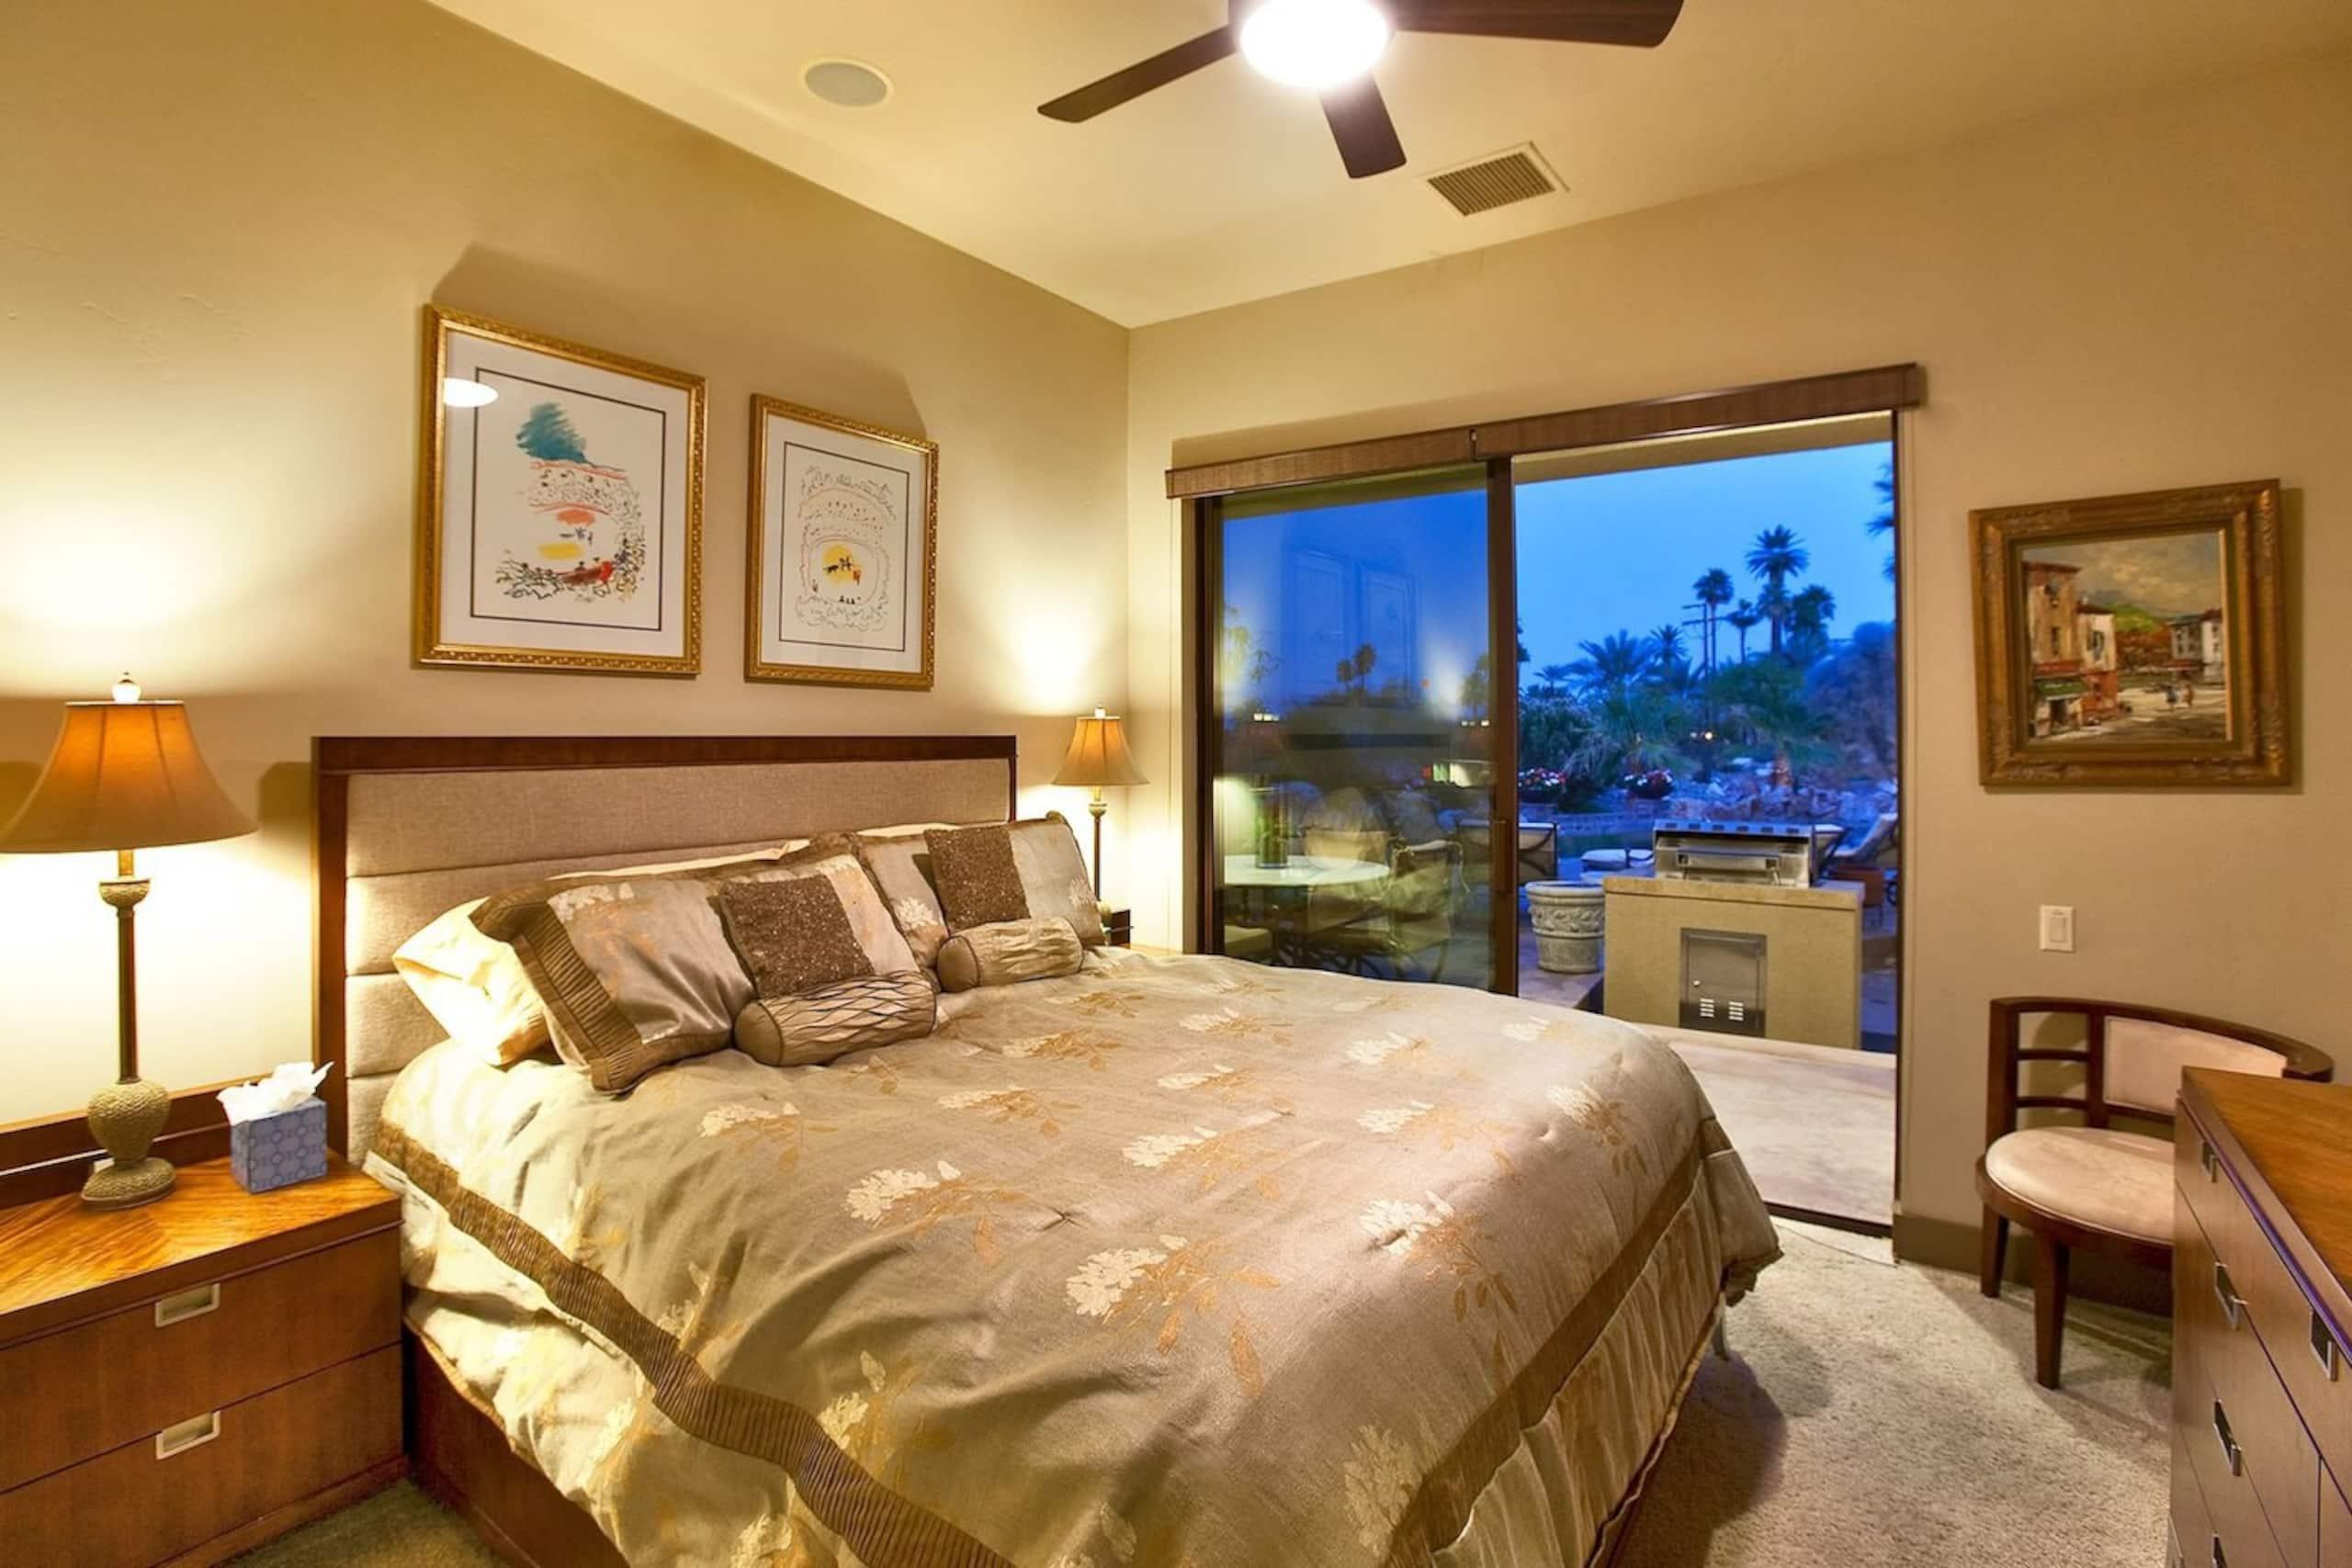 Apartment Villa Elmo - Marvelous 5 Bedrooms photo 20348366